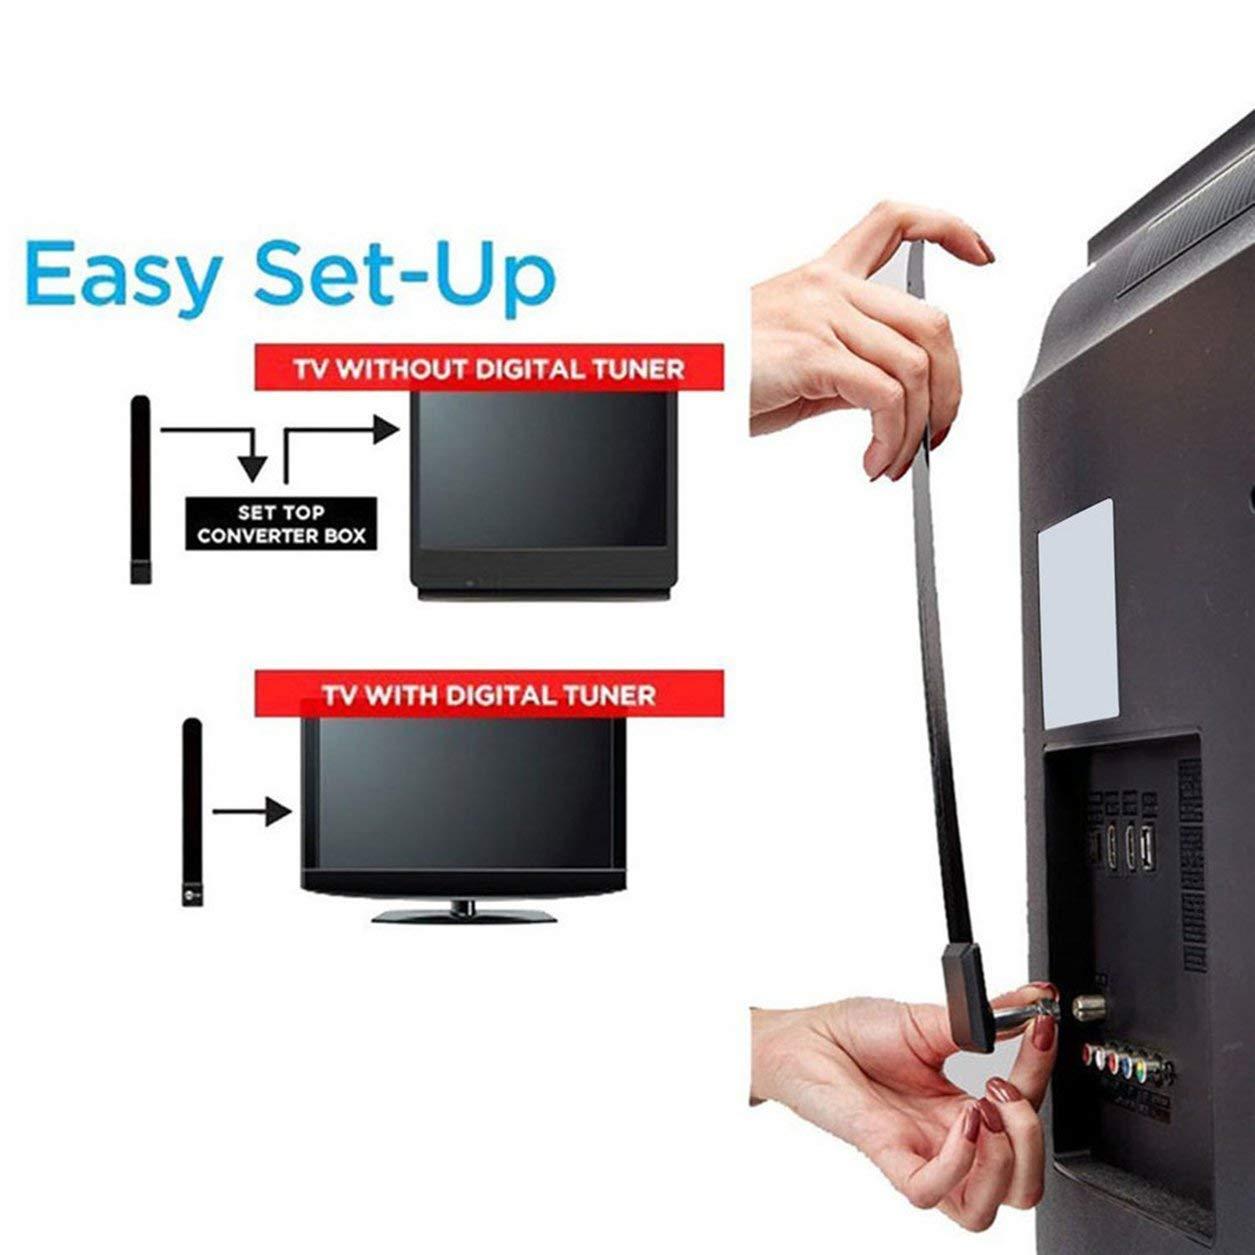 Black Digital Aerial Clear TV Key HDTV Free TV Stick 1080p HD Indoor TV Aerial Dailyinshop